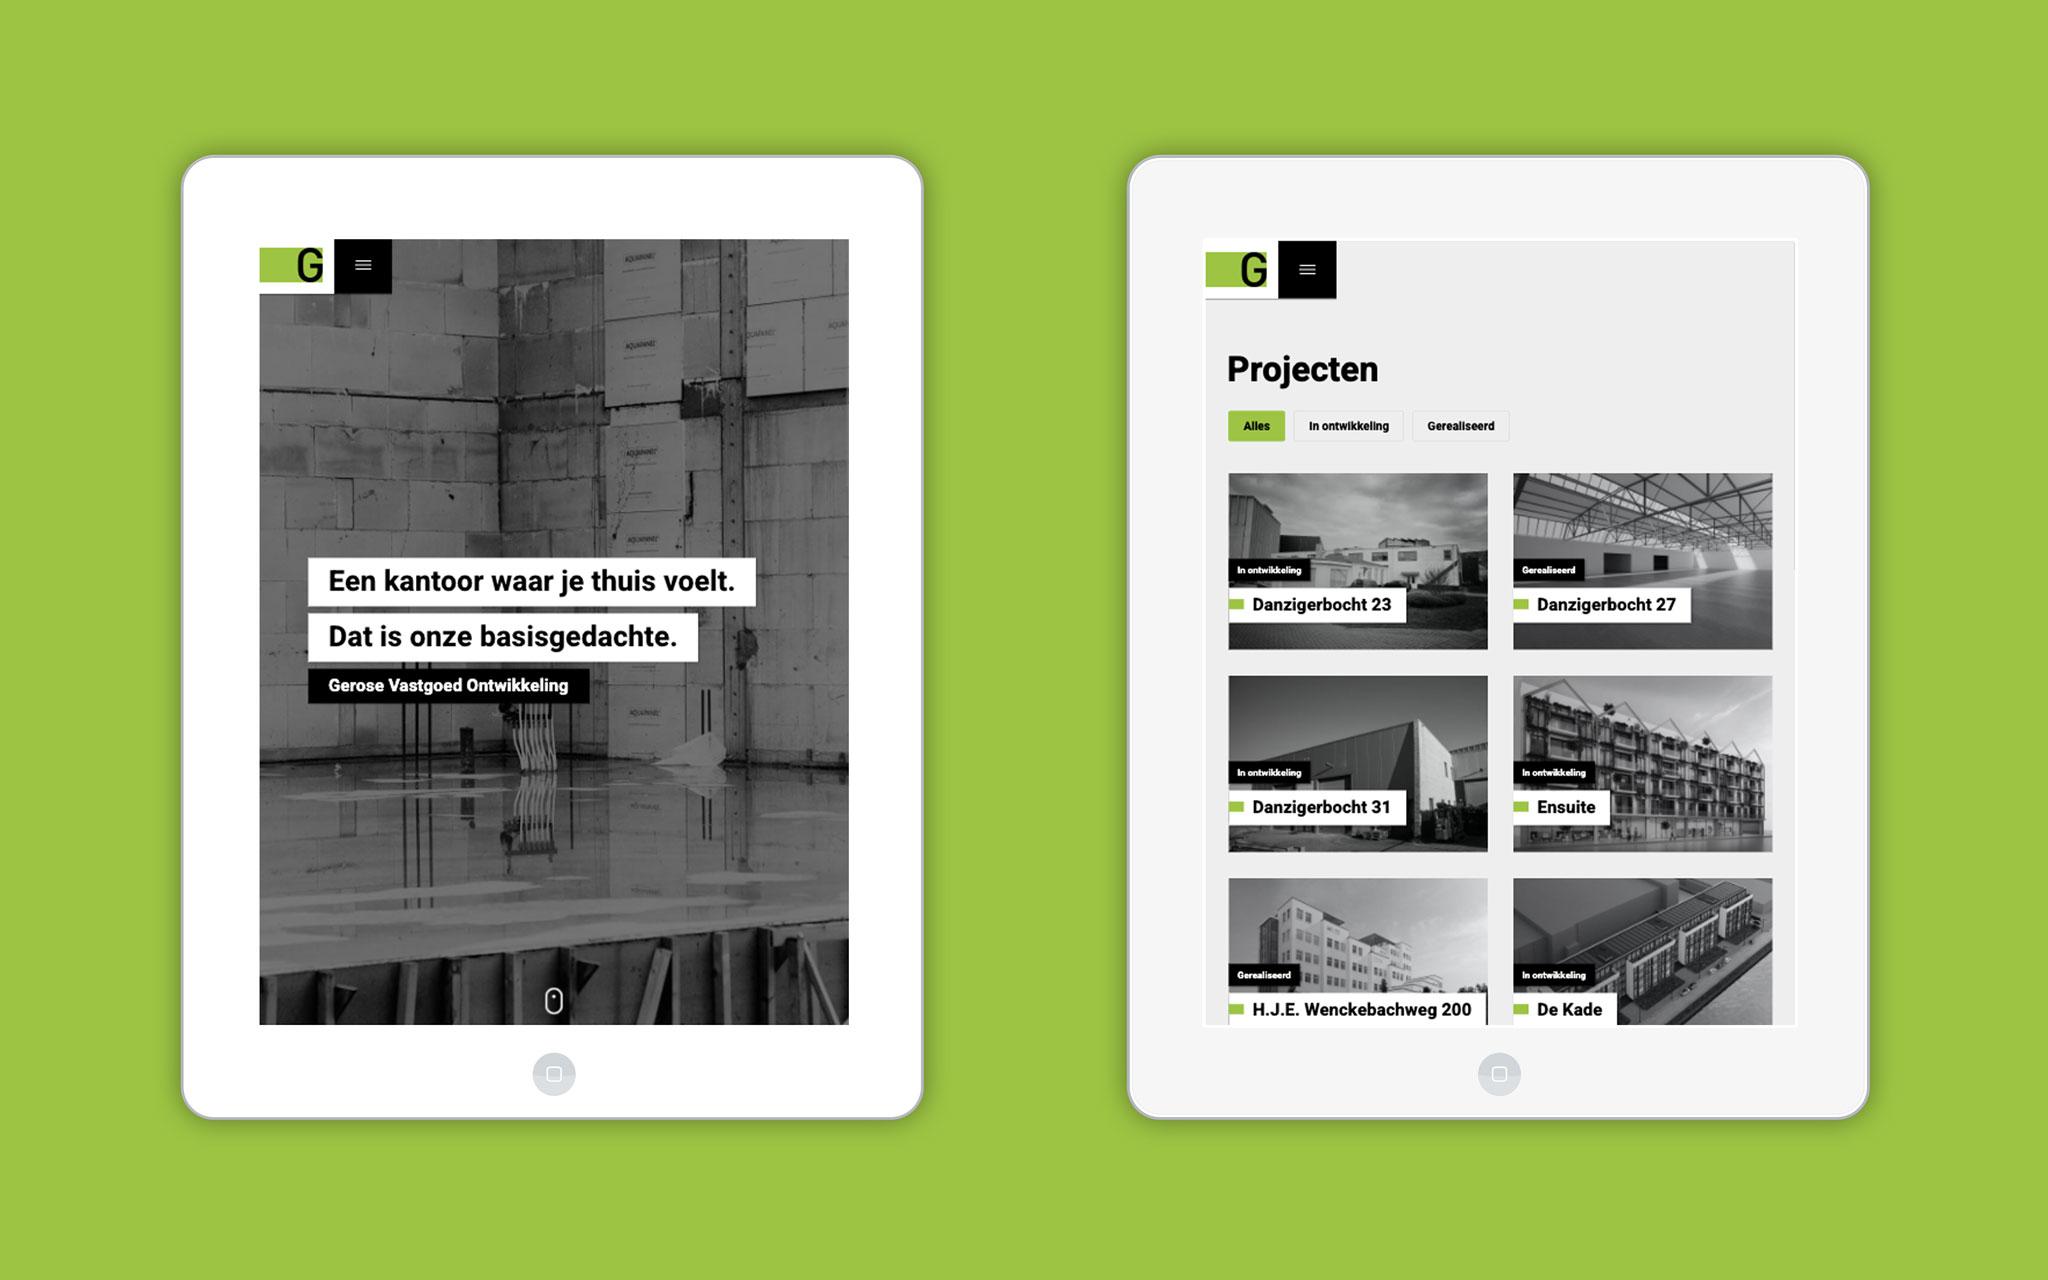 Gerose Vastgoed Ontwikkeling website ontwerp op tablet